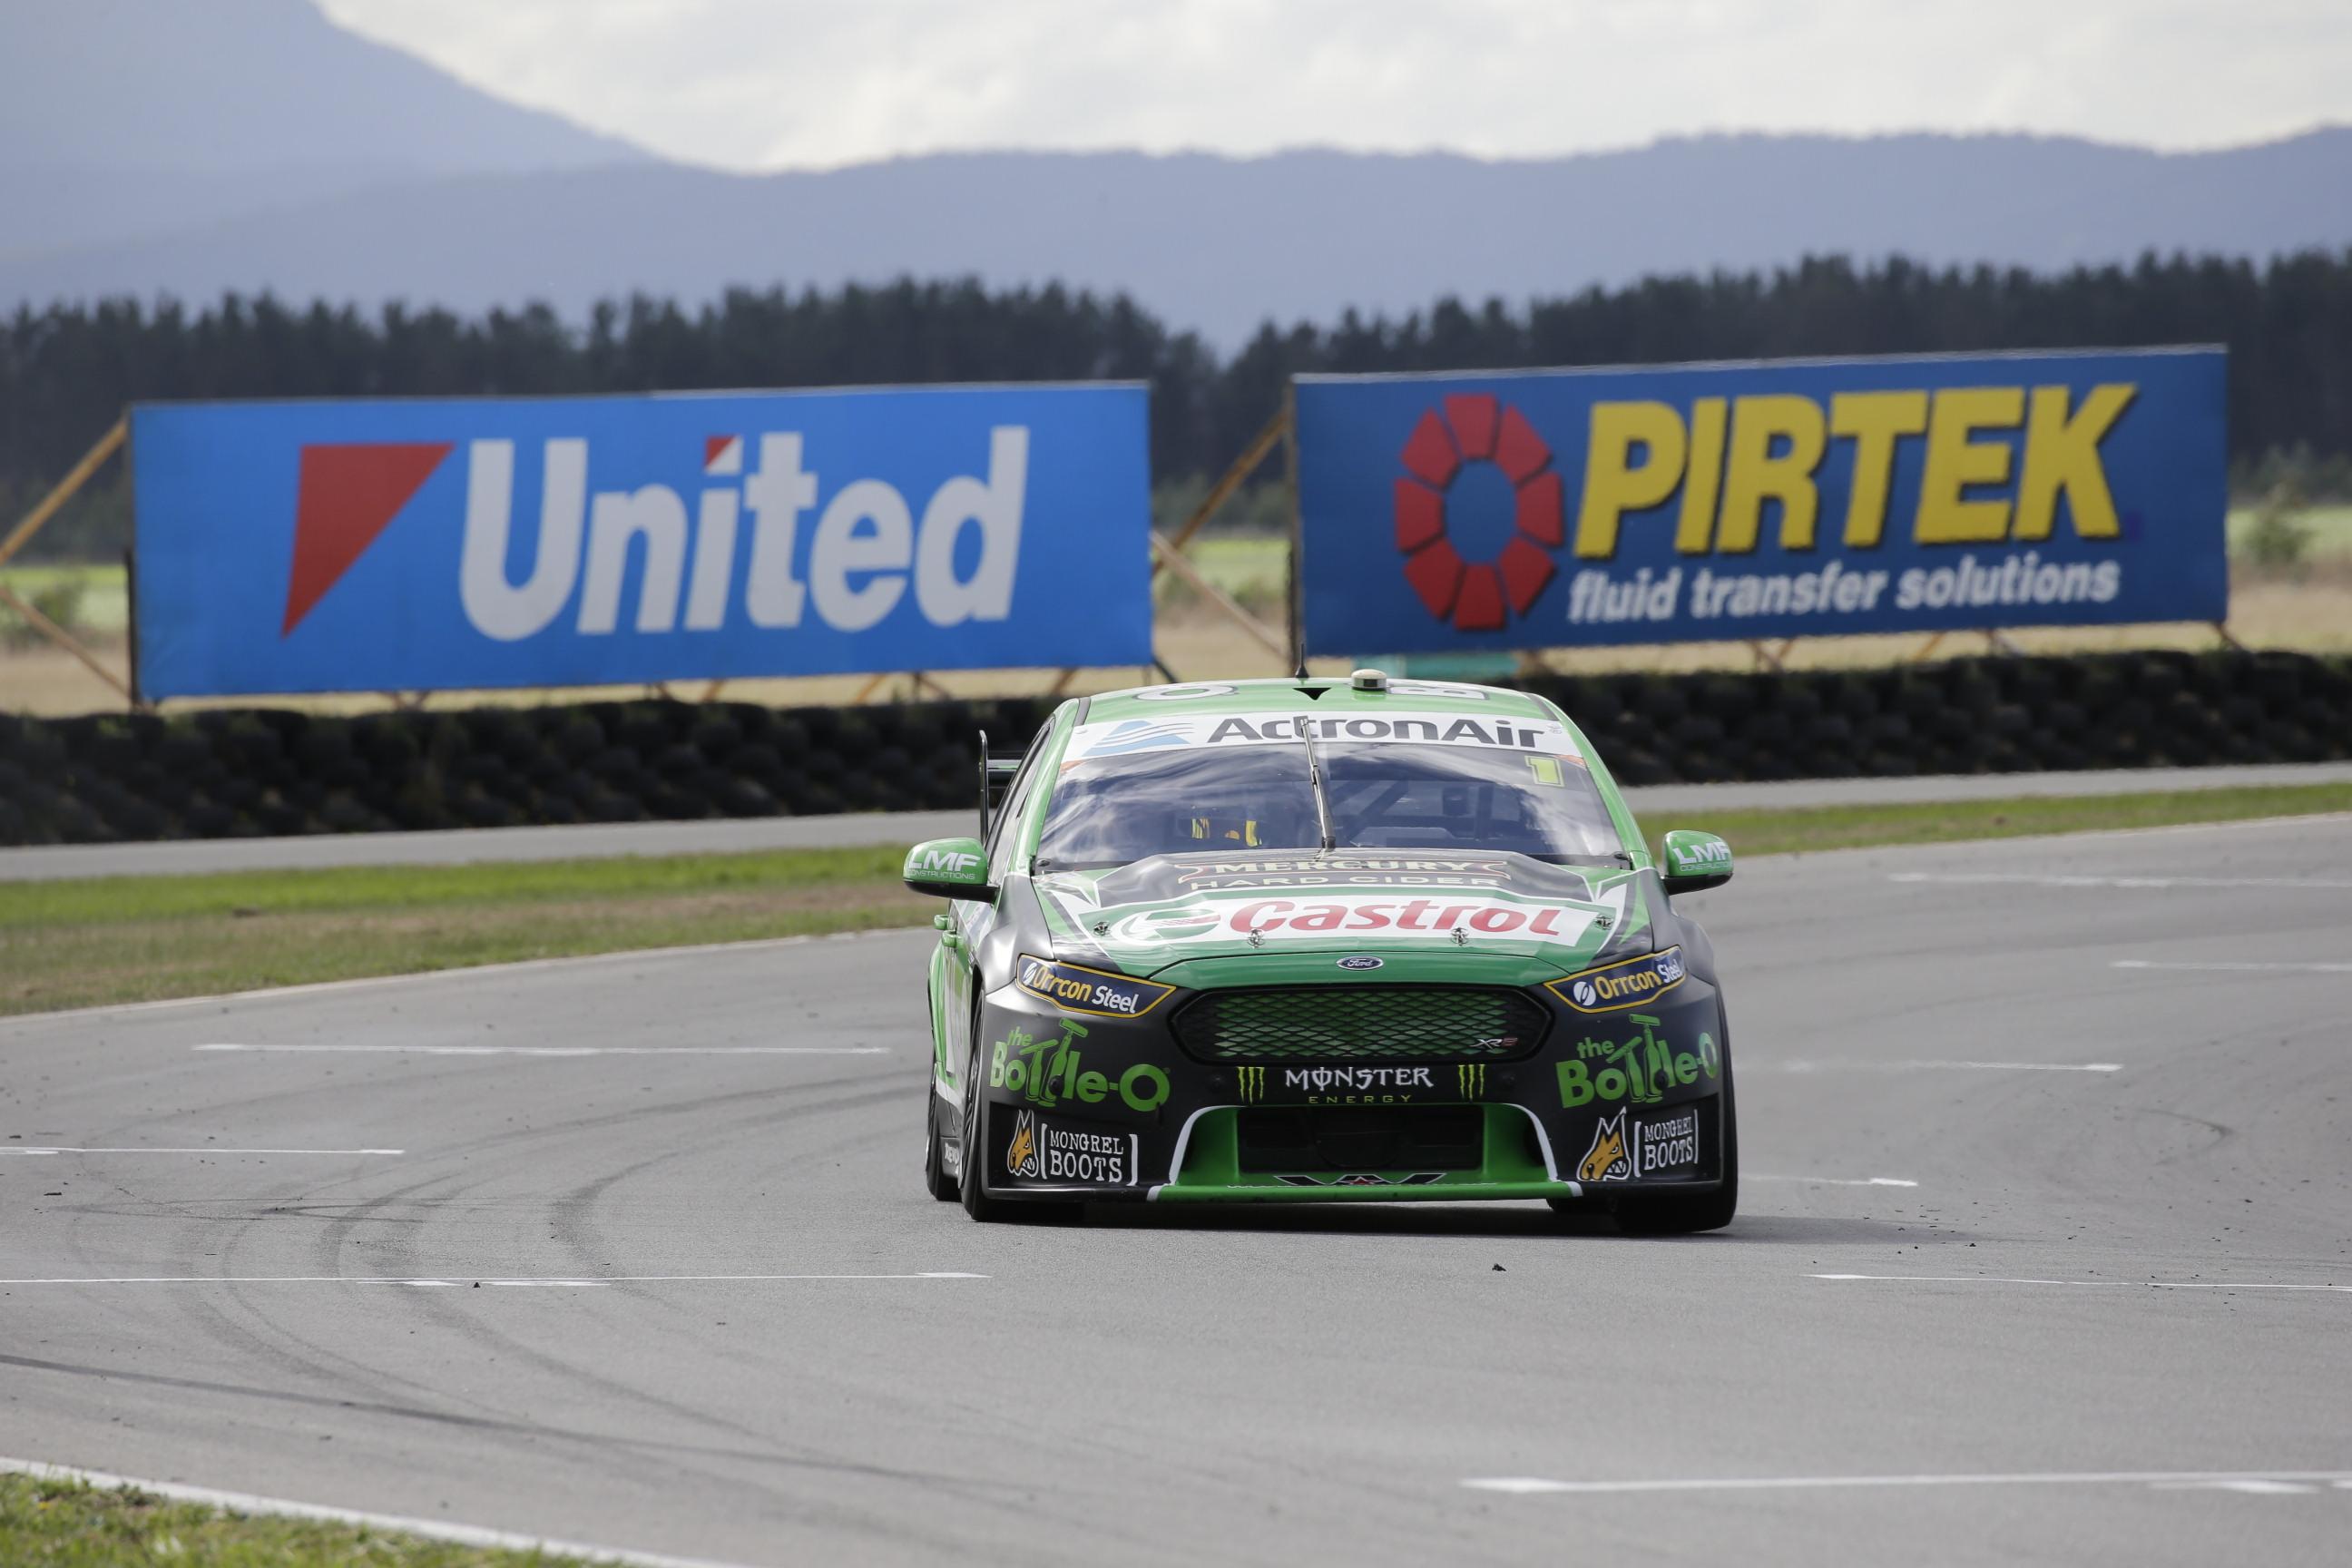 Winterbottom Tasmania Qualifying Race 4